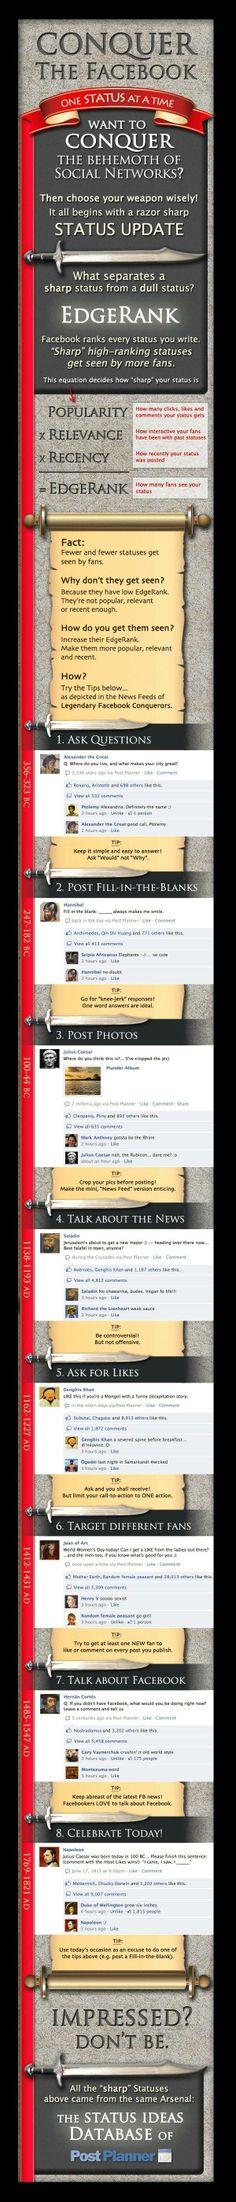 Improving Facebook Edgerank Infographic